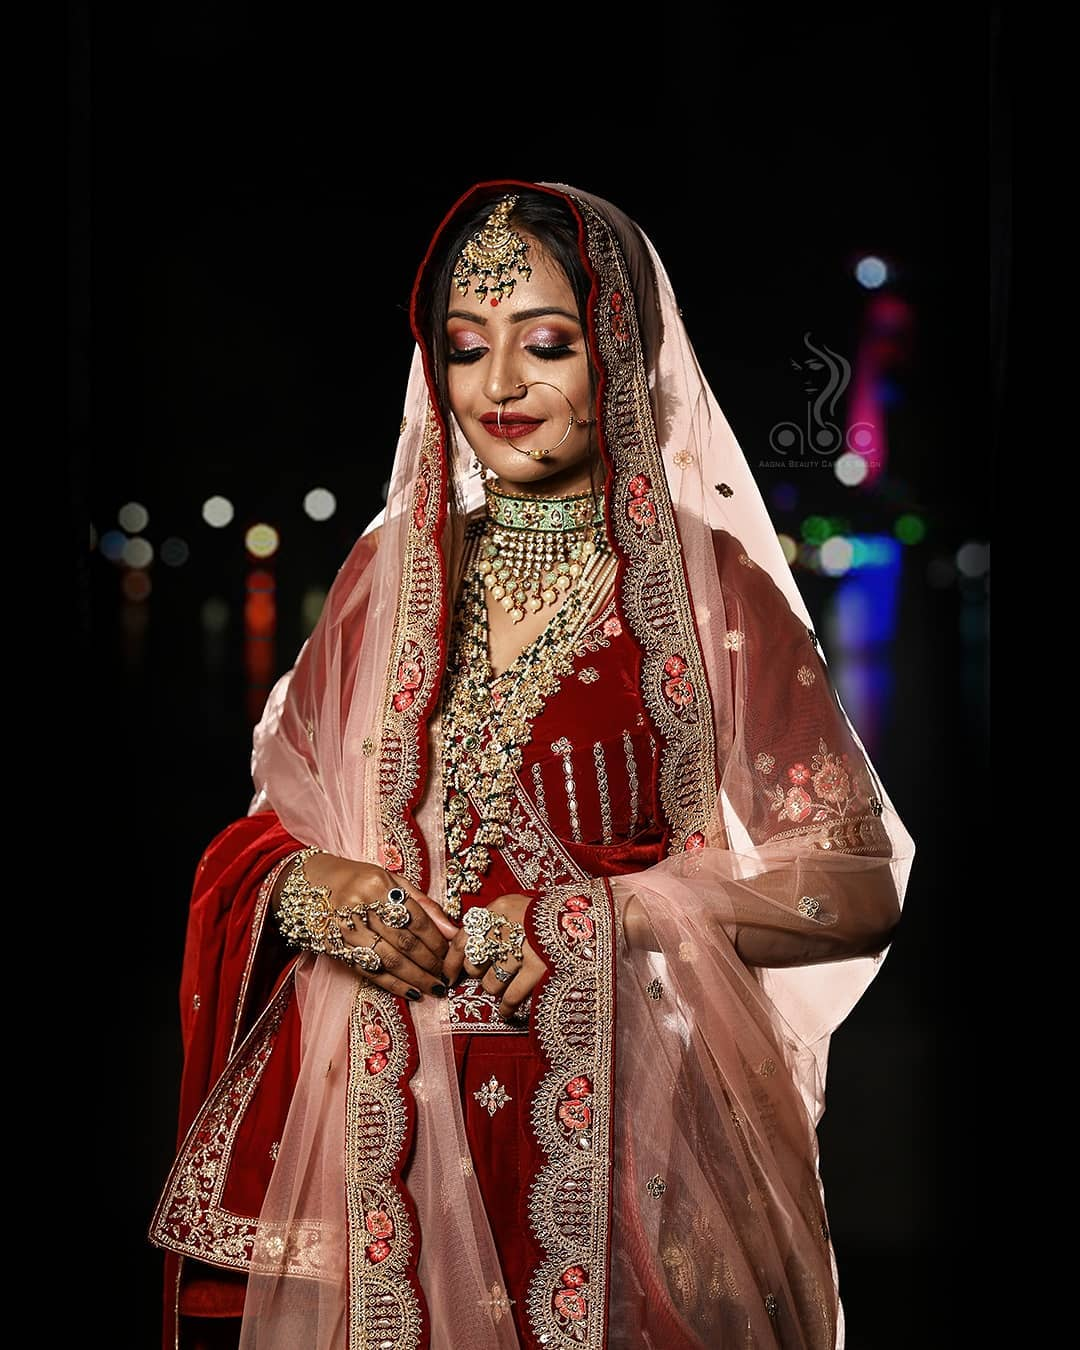 Makeup and Garment shoot.. . Makeover by @_aagna_beauty_care_ Tieup:  @studio_a_the_family_salon Click & Retouch by :@dip_memento_photography Assist: @ll_ii_mr.tendulkar_ii_ll Model : @highness.__99 Outfit: Eva Designers Support & help: @ashish.kotadiya.75 . . #beautiful#bride #dipmementophotography #beauty#9924227745#bridestyle#bridestory#wedding#weddingphotography#weddingdress#weddinginspiration#weddingideas#weddingphotographer#weddingdiaries#weddingbrigade#indianwedding#photography